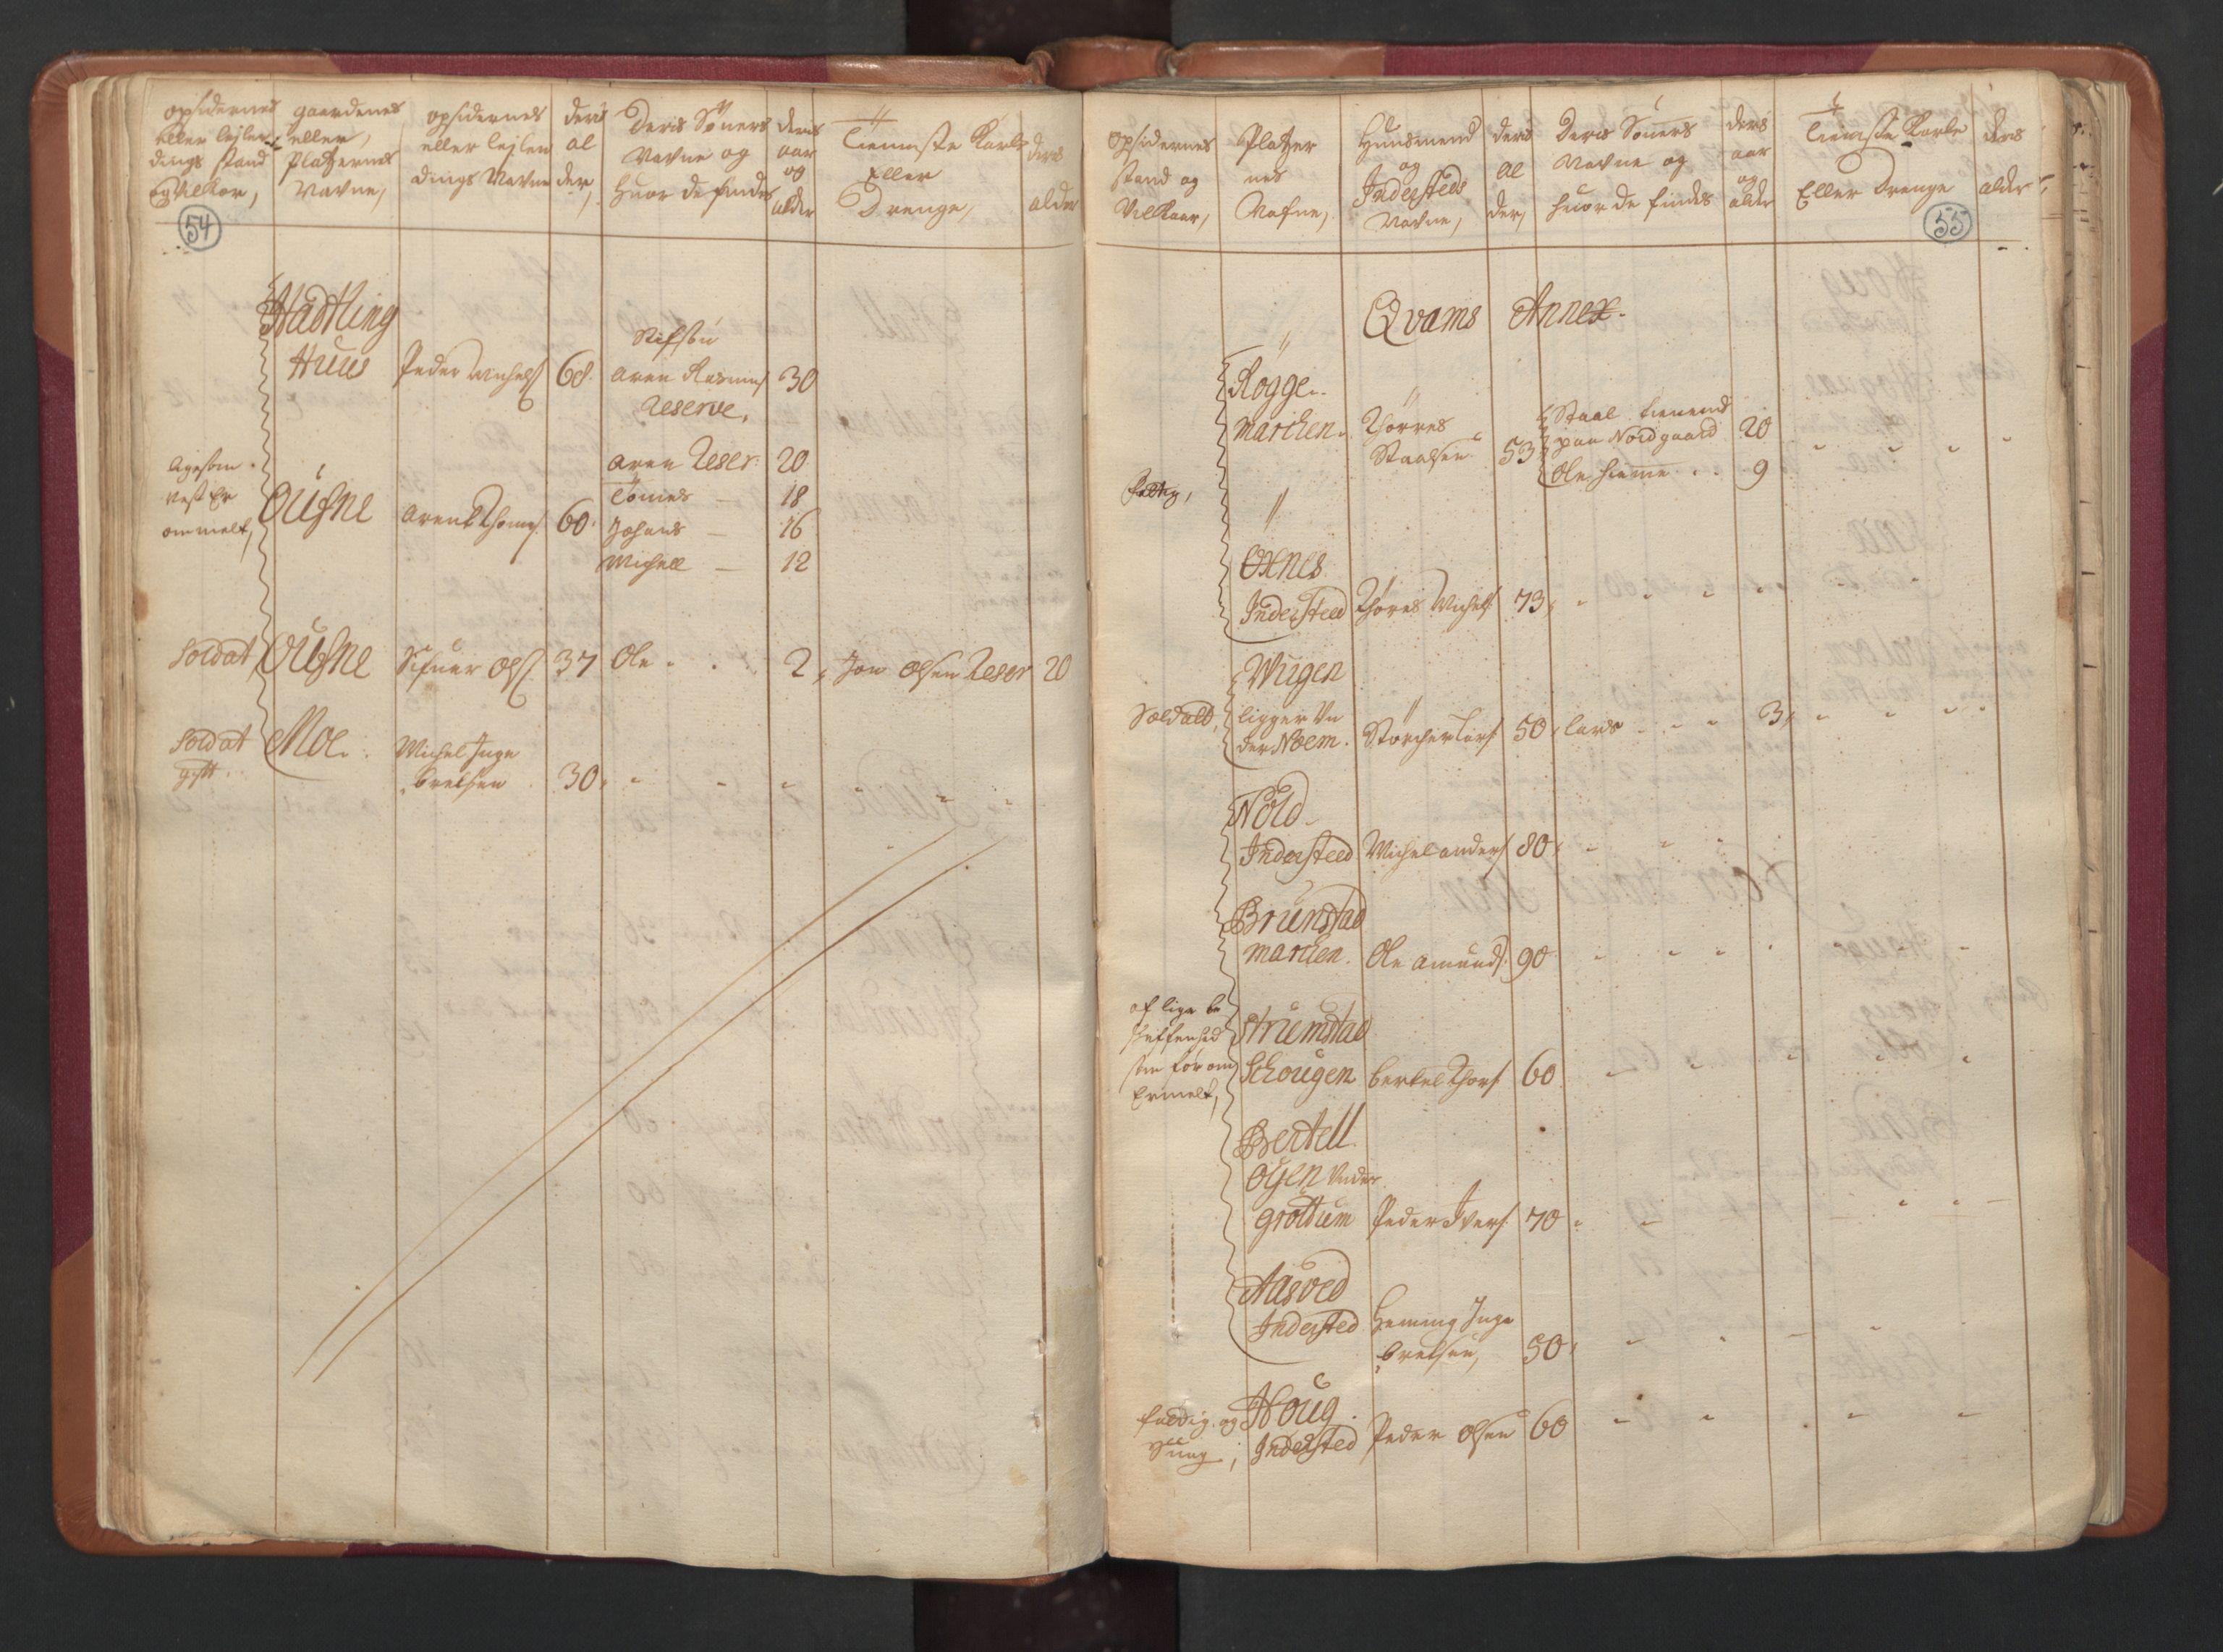 RA, Manntallet 1701, nr. 15: Inderøy fogderi og Namdal fogderi, 1701, s. 54-55